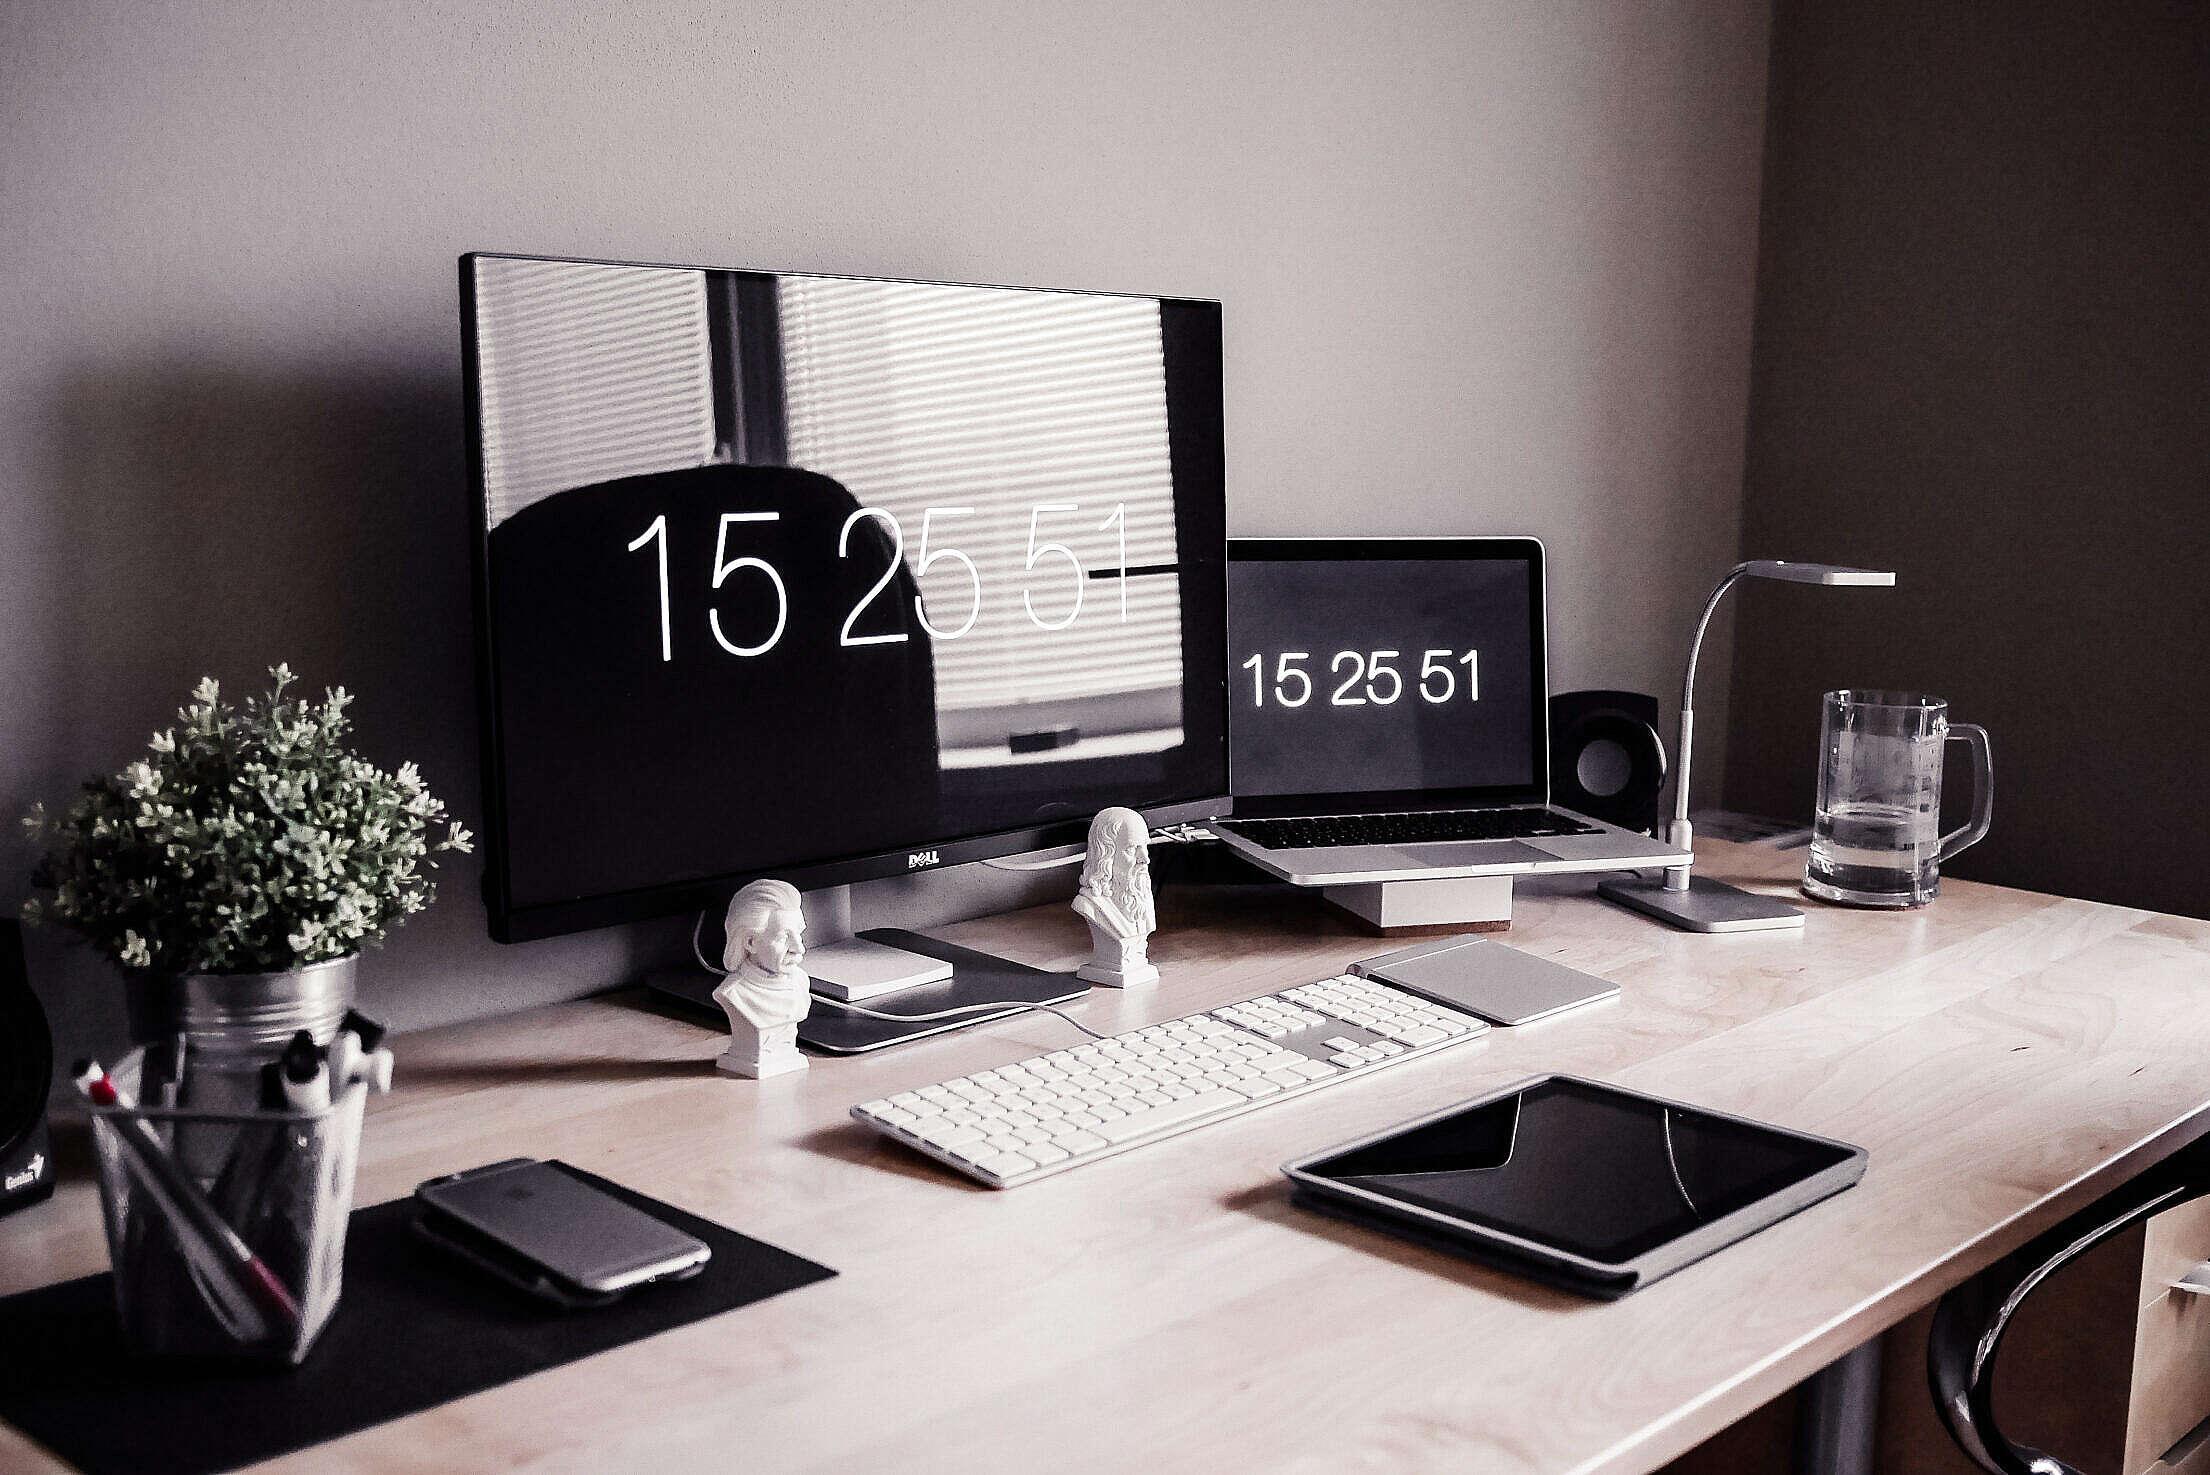 Minimalist Home Office Workspace Desk Setup Free Stock Photo